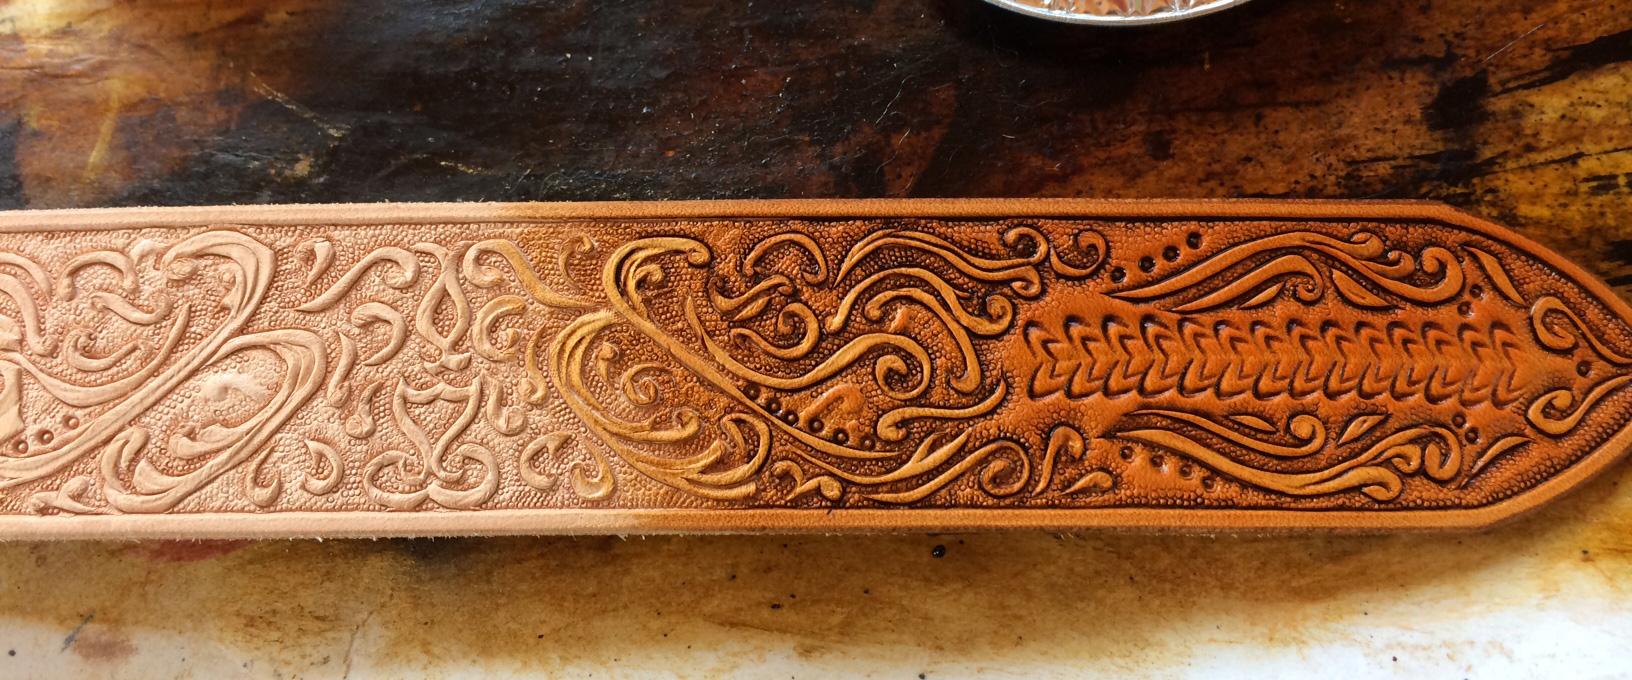 Leather engraving monogramming painting debossing and embossing